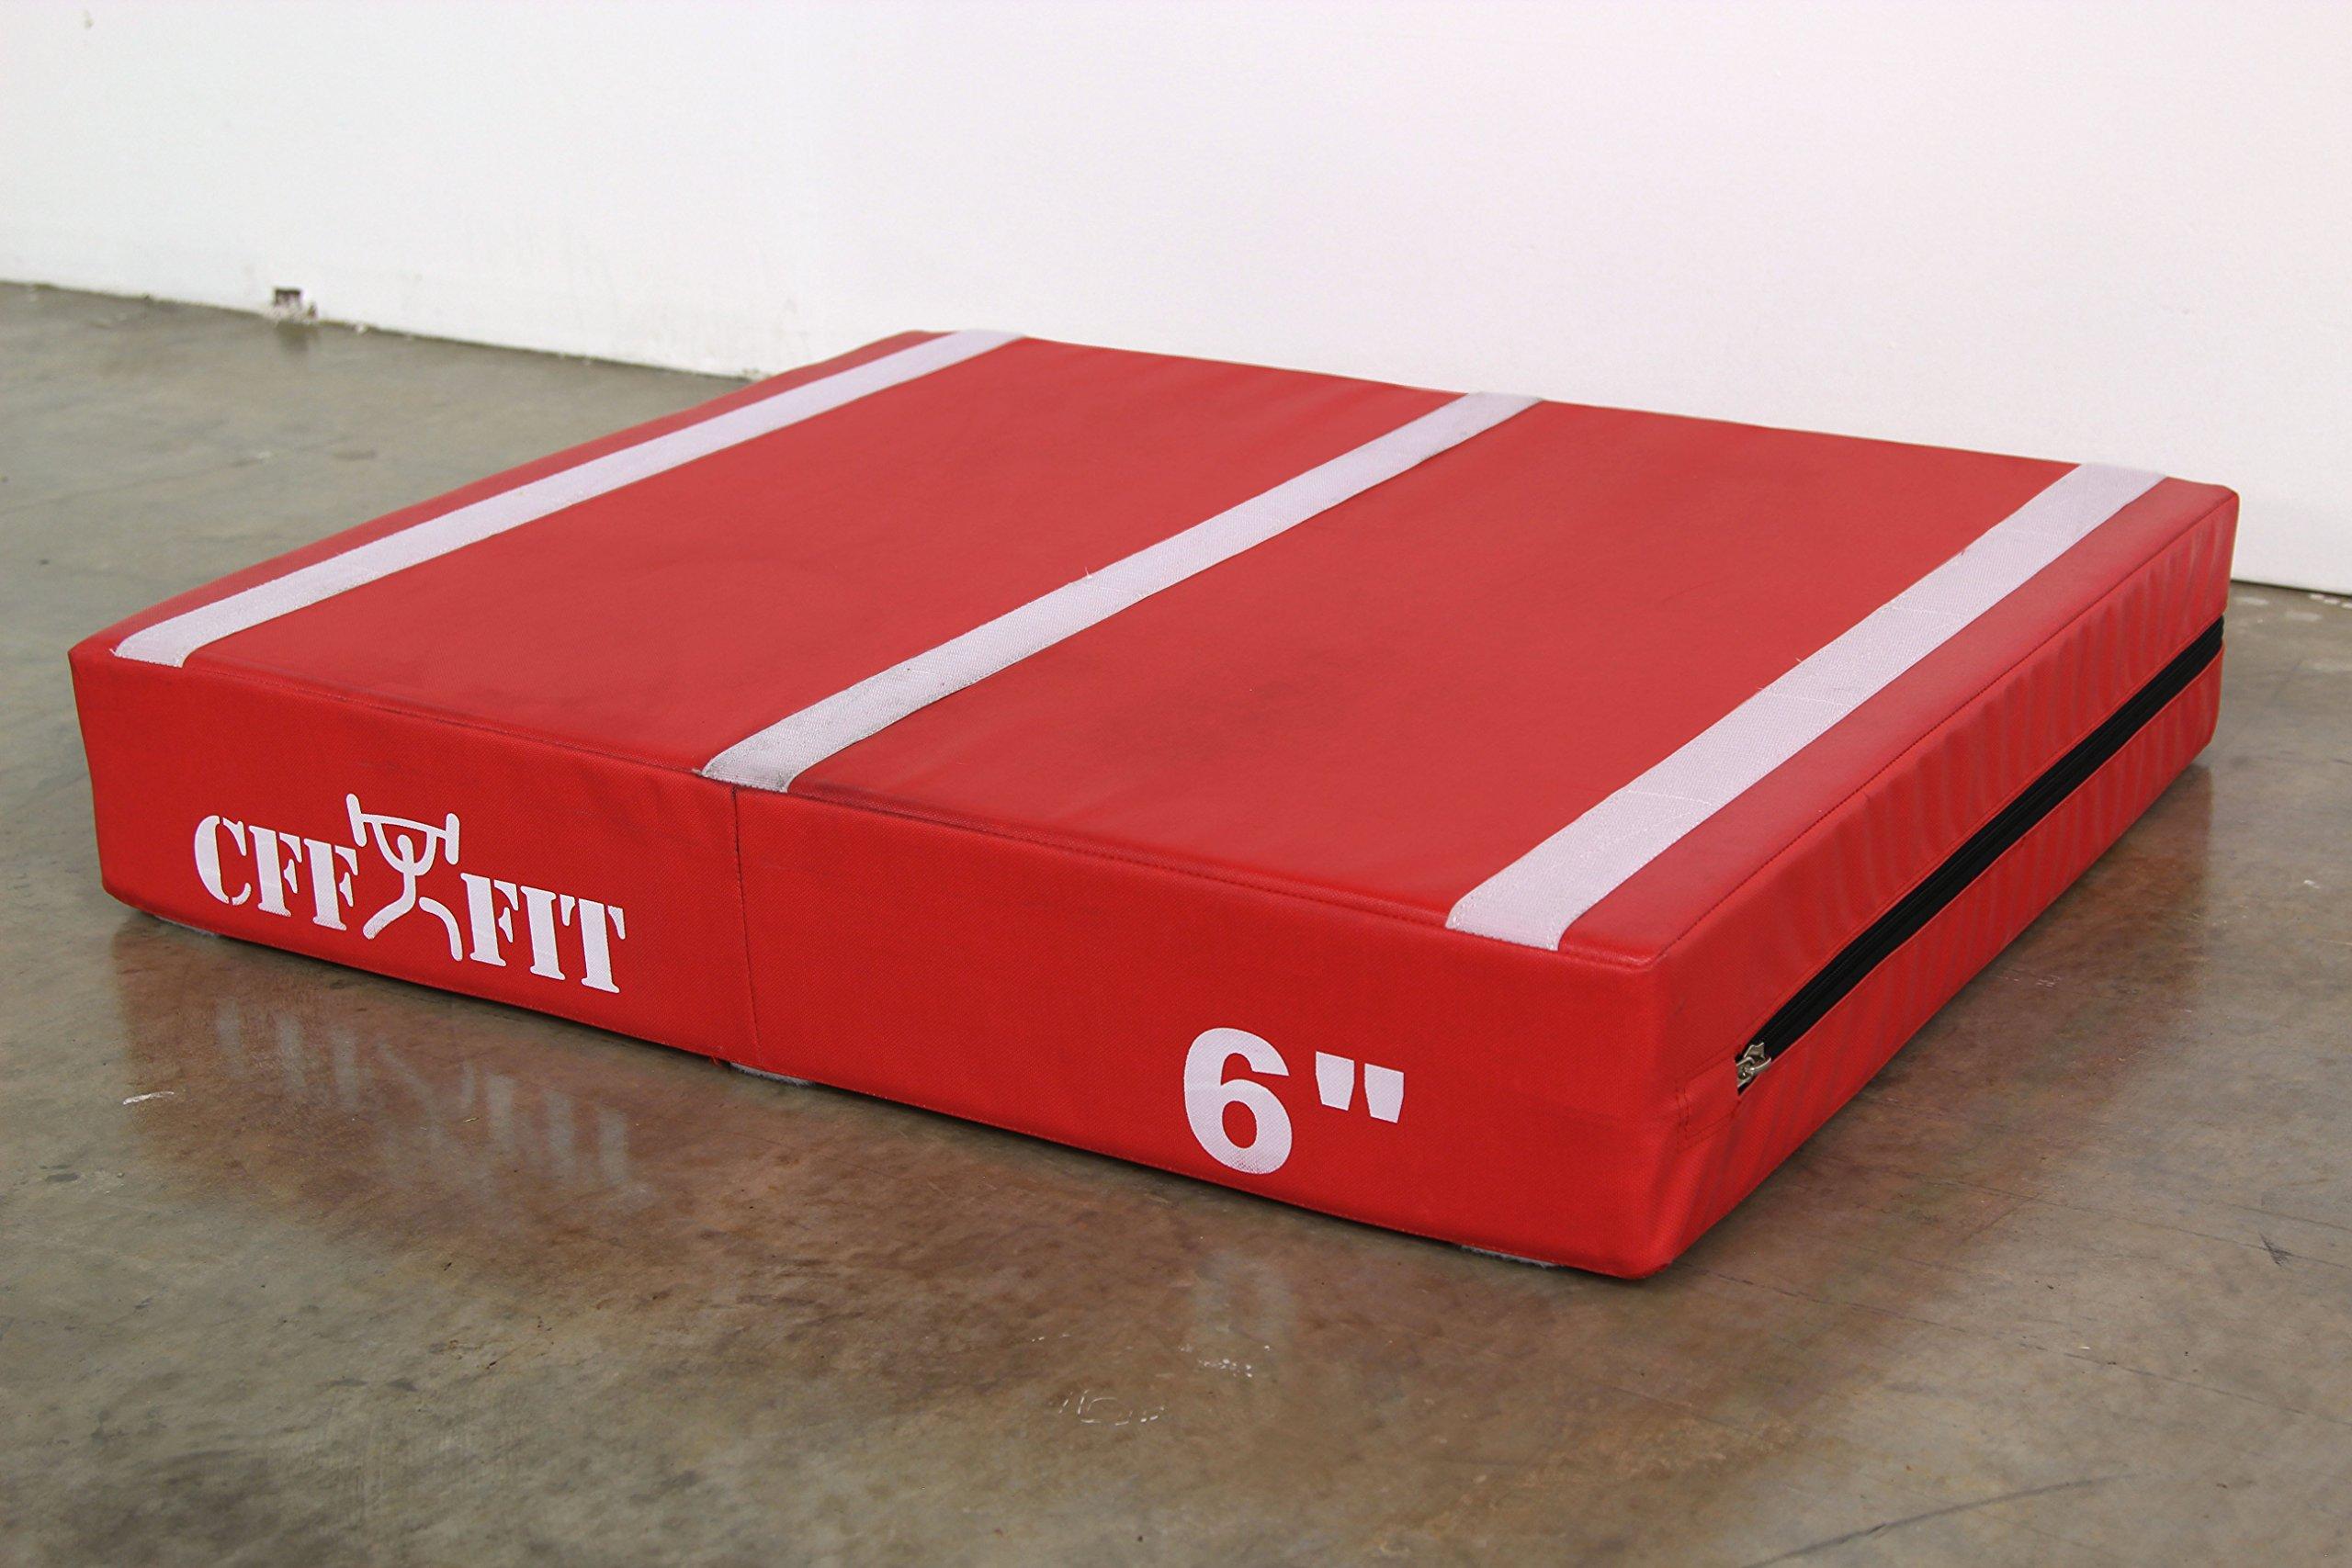 CFF Cushion Plyo Boxes (6 inch)